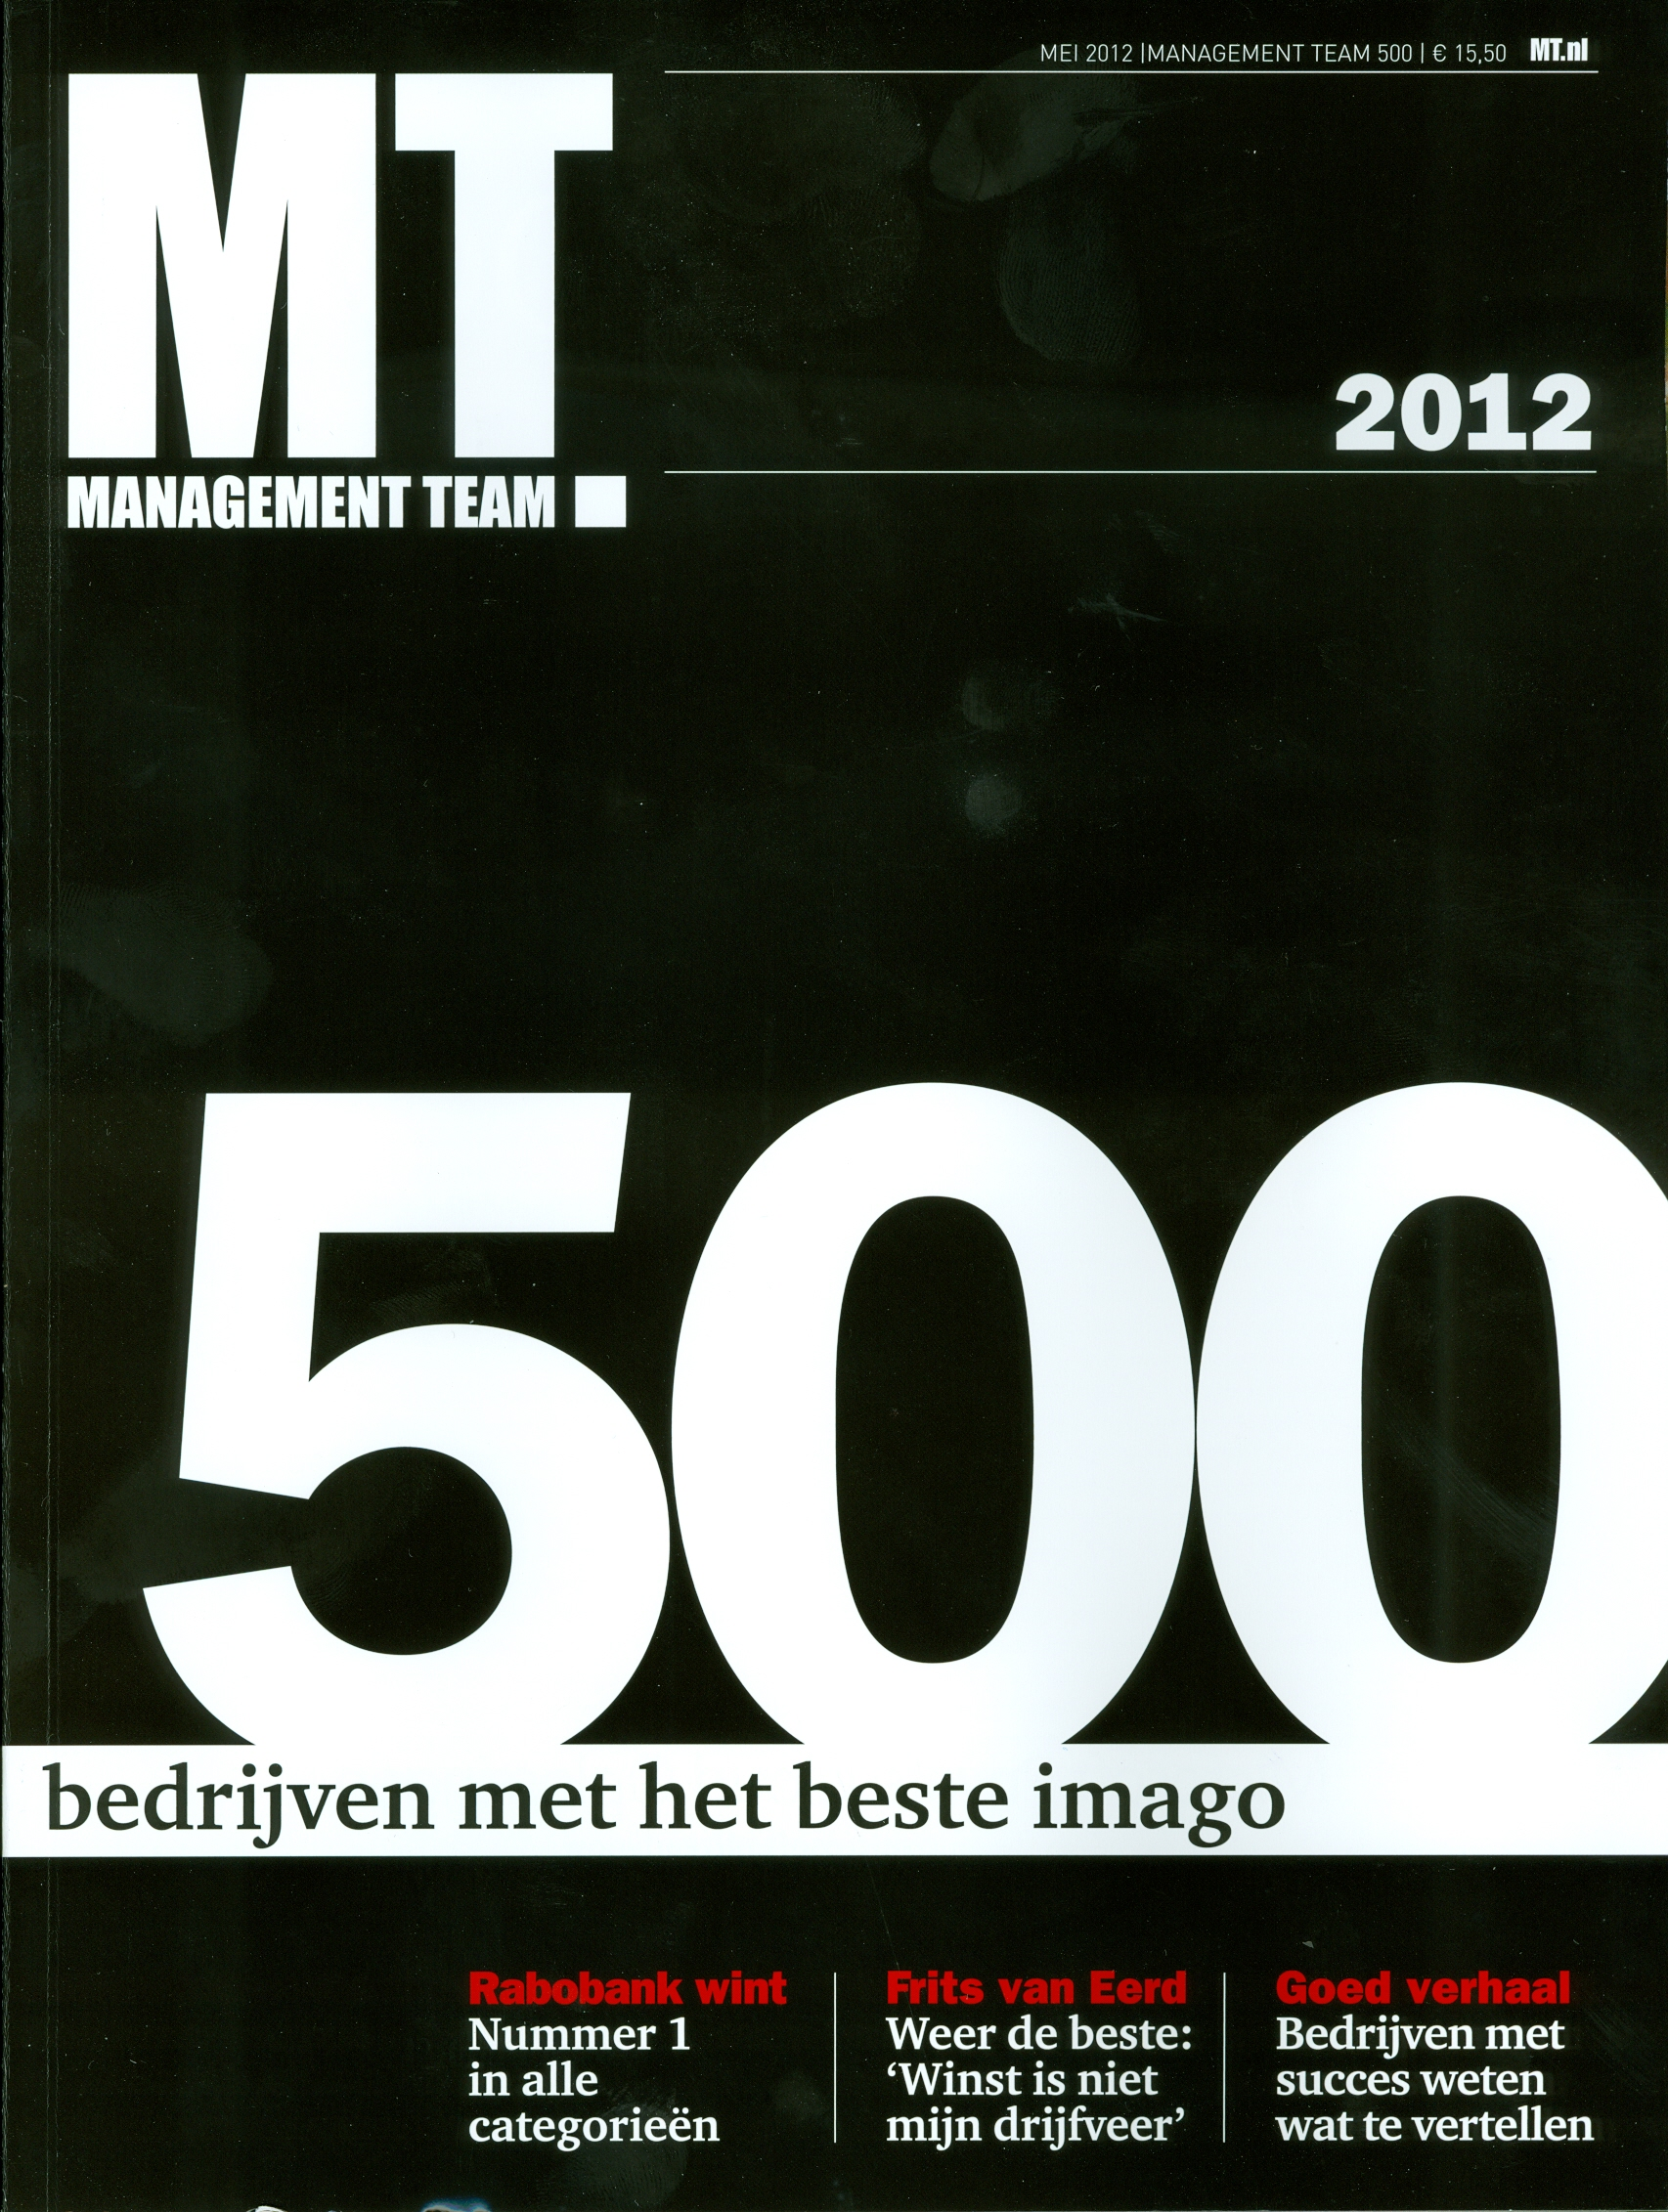 MT500 - 2012